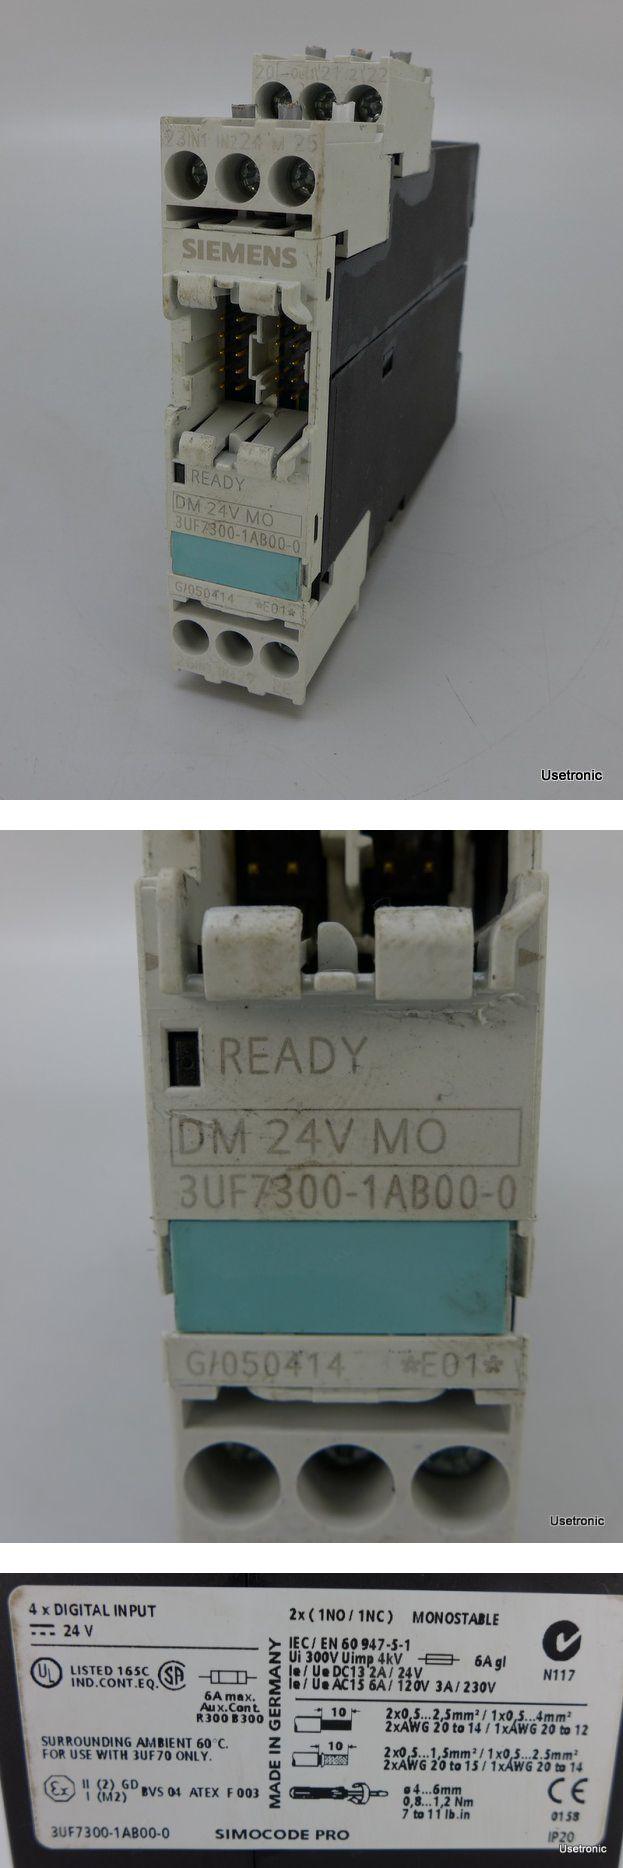 Siemens Simocode Pro 3UF7300-1AB00-0